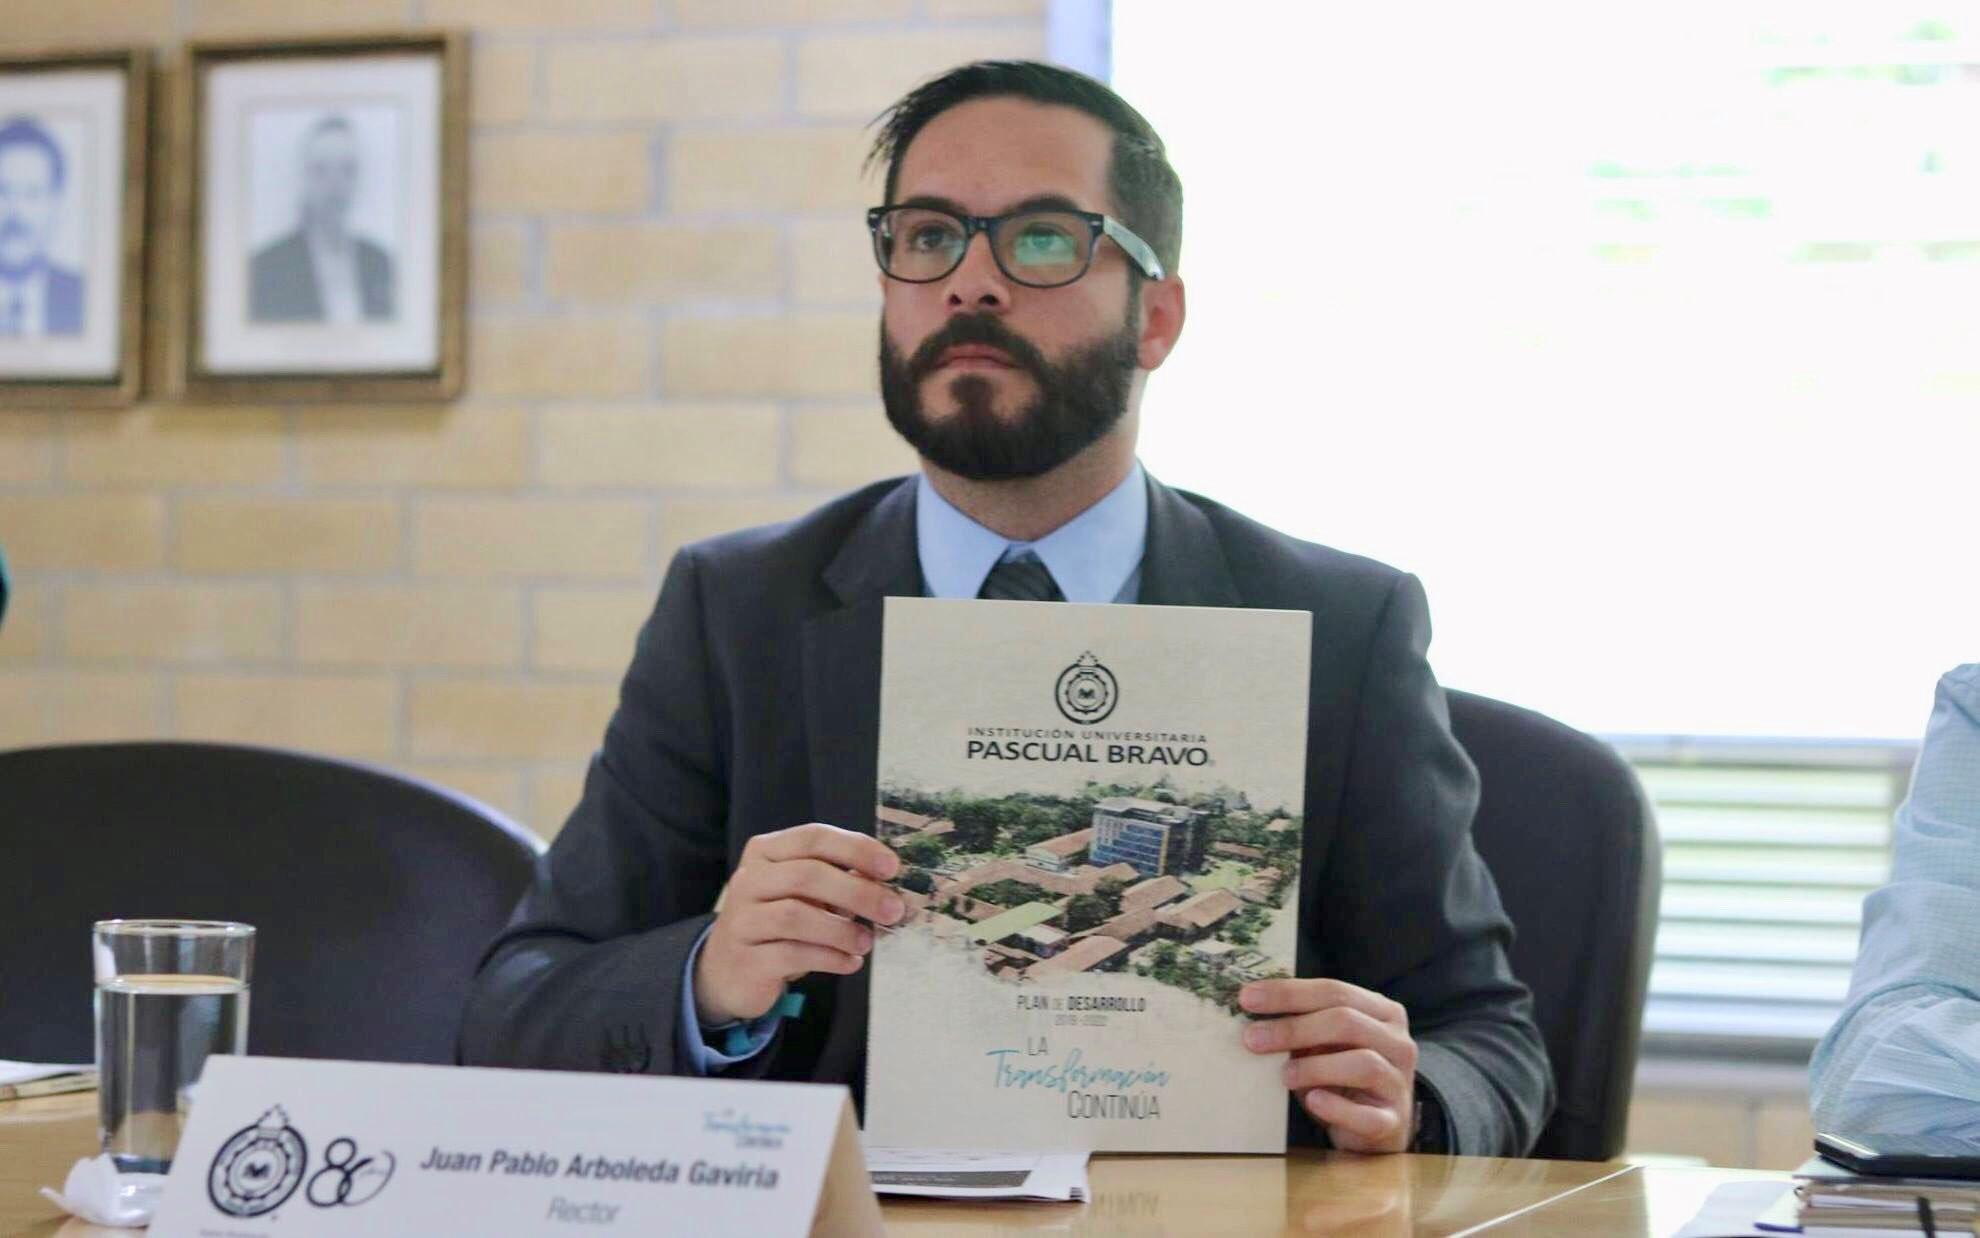 Rector Pascual Bravo, Juan Pablo Arboleda